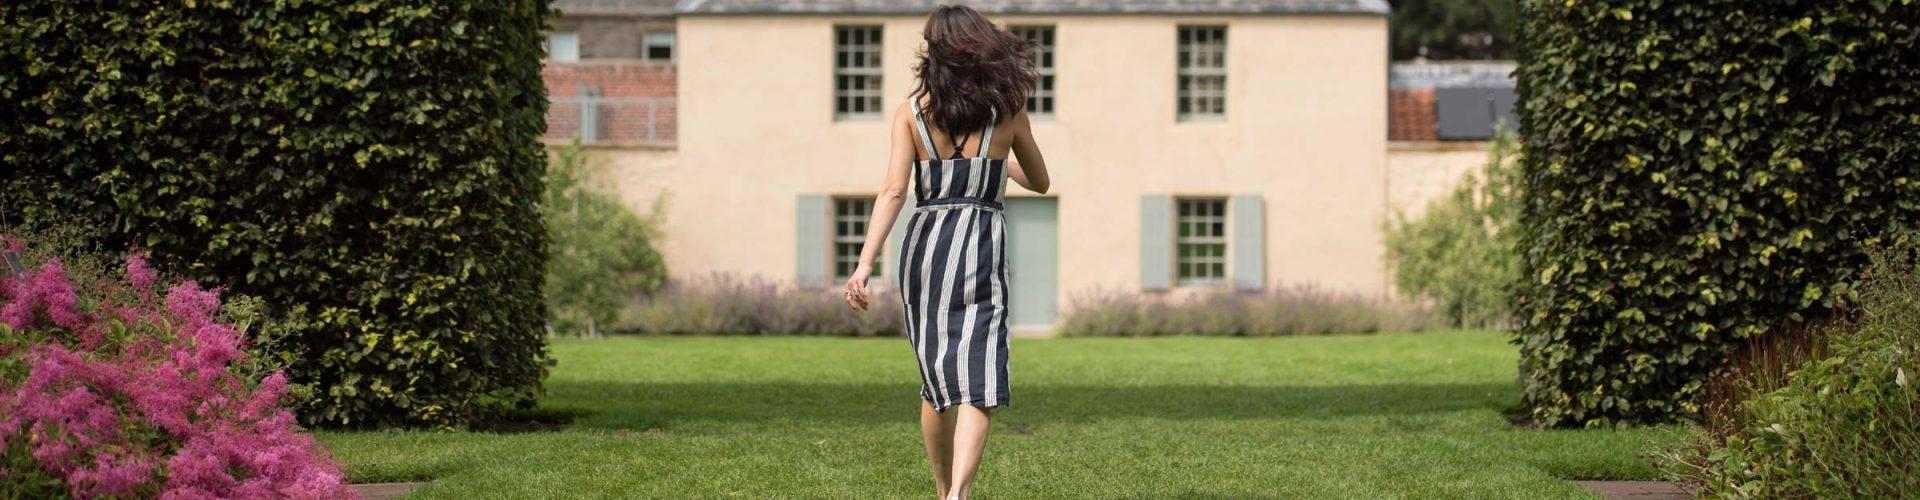 Woman in summer dress walking through the Botanic Gardens in Edinburgh